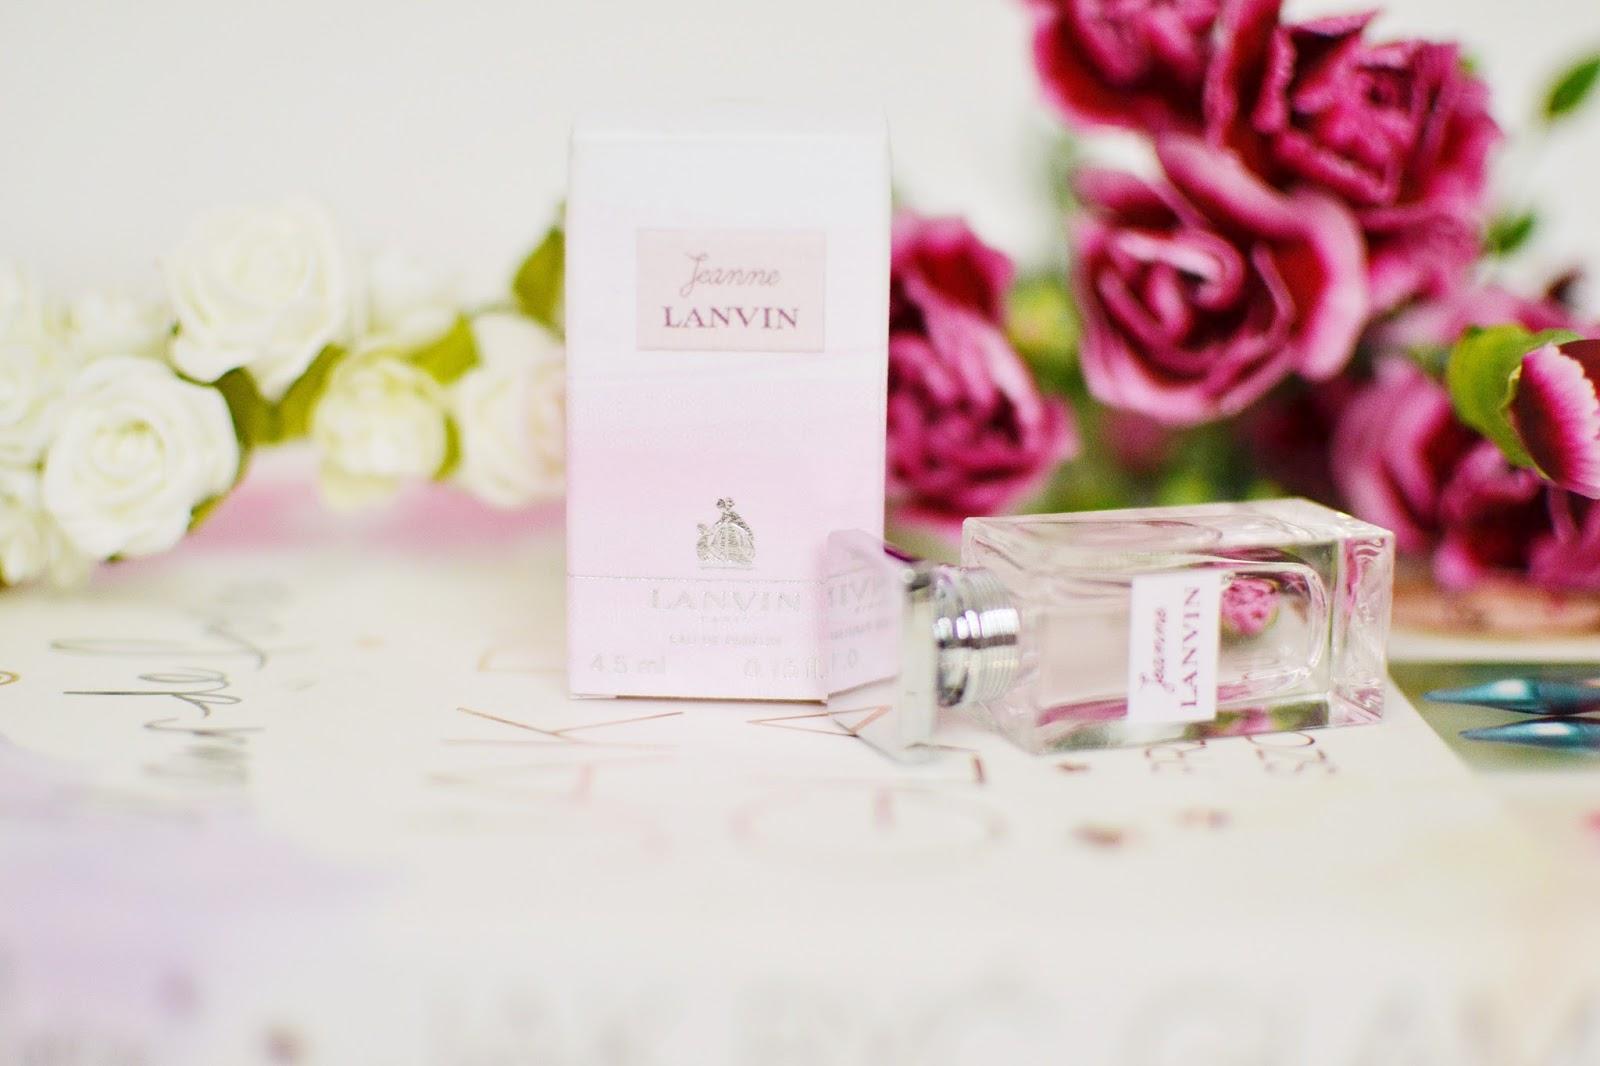 Słodkie, delikatne, cytrusowe perfumy na lato- Lanvin Jeanne